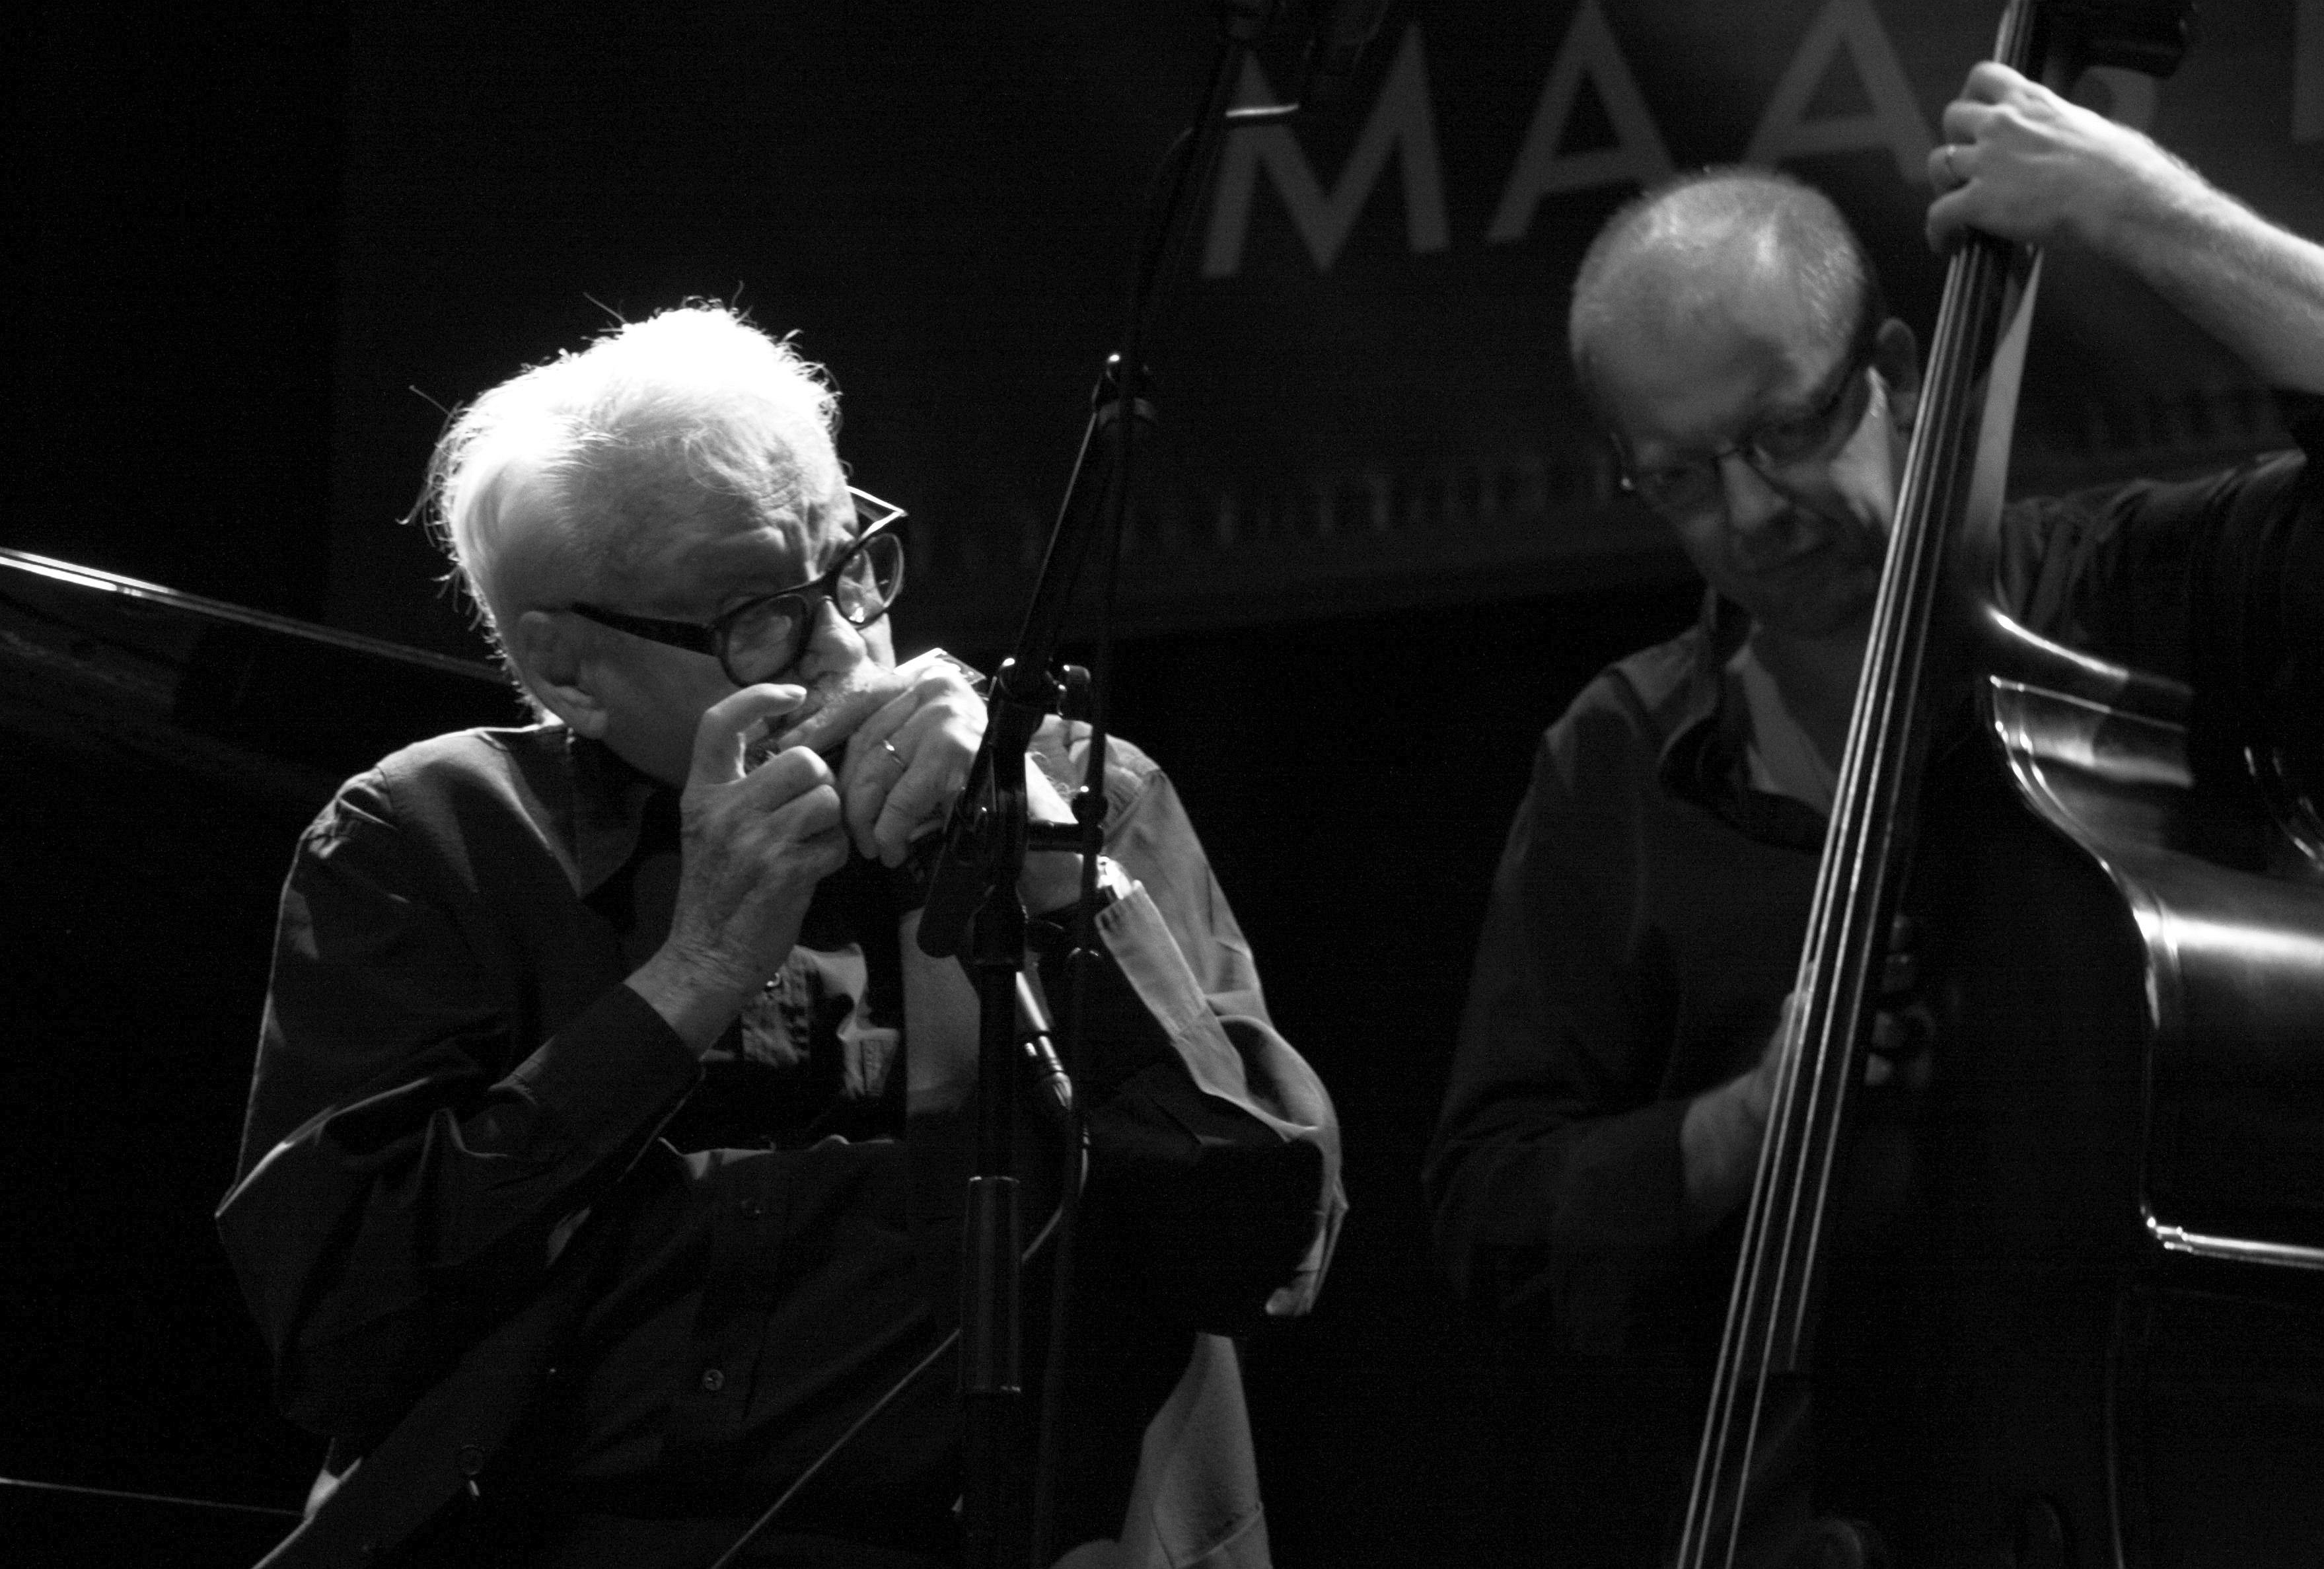 Toots Thielemans - Mecc Jazz Festival -Maastricht - 29 Oct. 2010